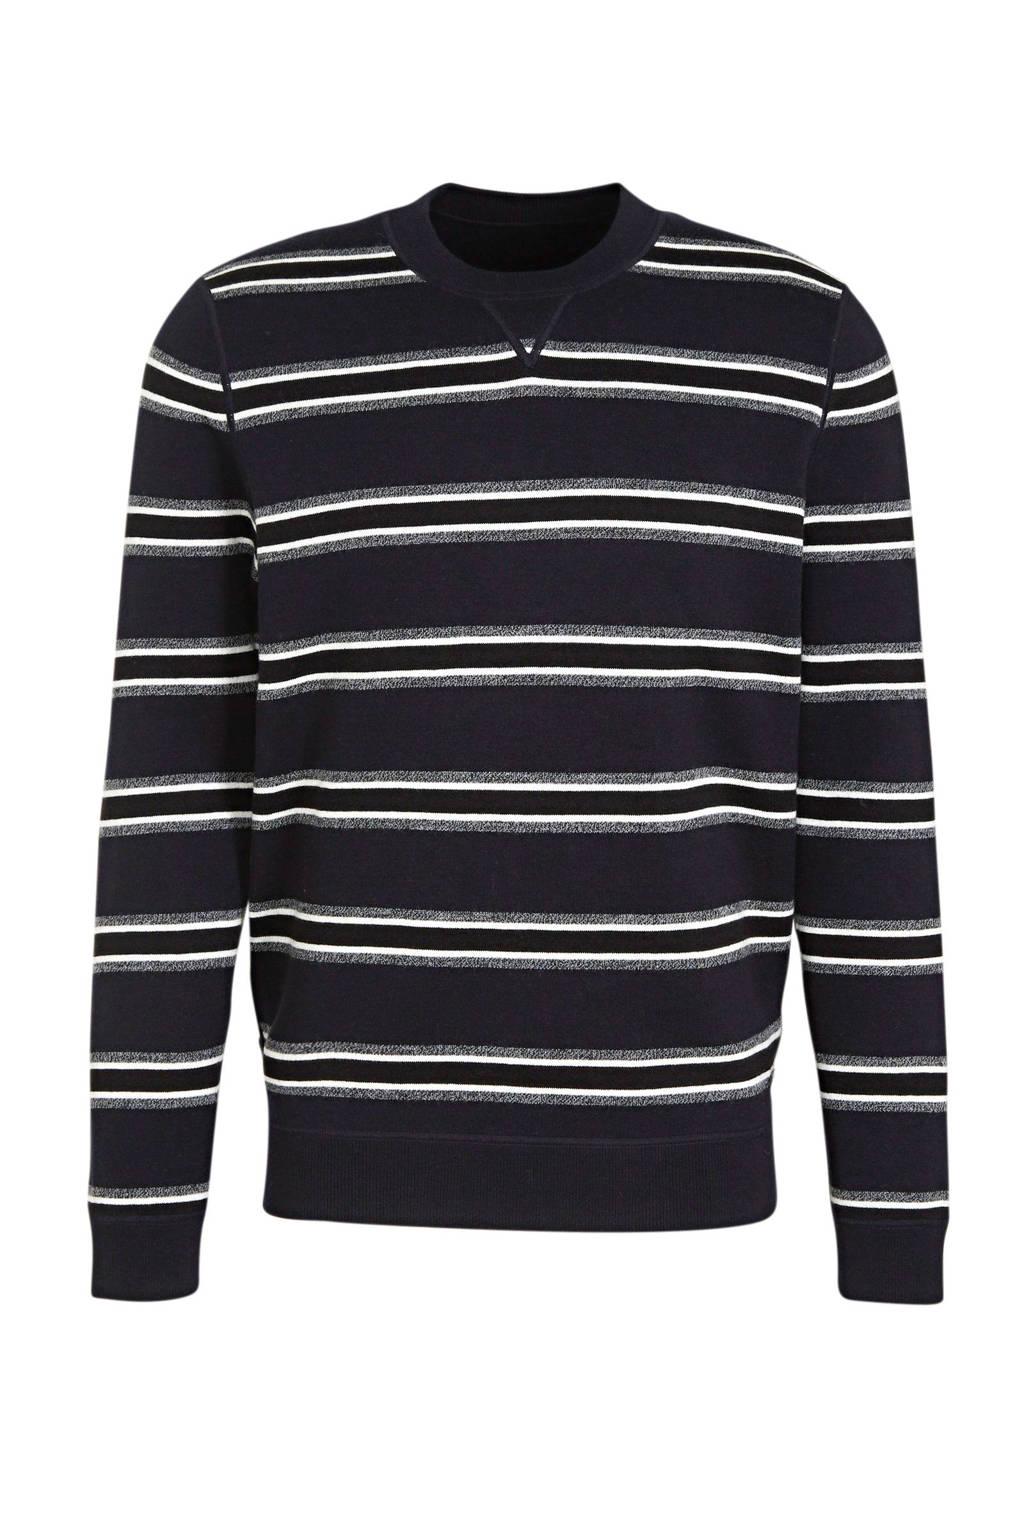 BOSS Menswear reversible sweater donkerblauw, Donkerblauw